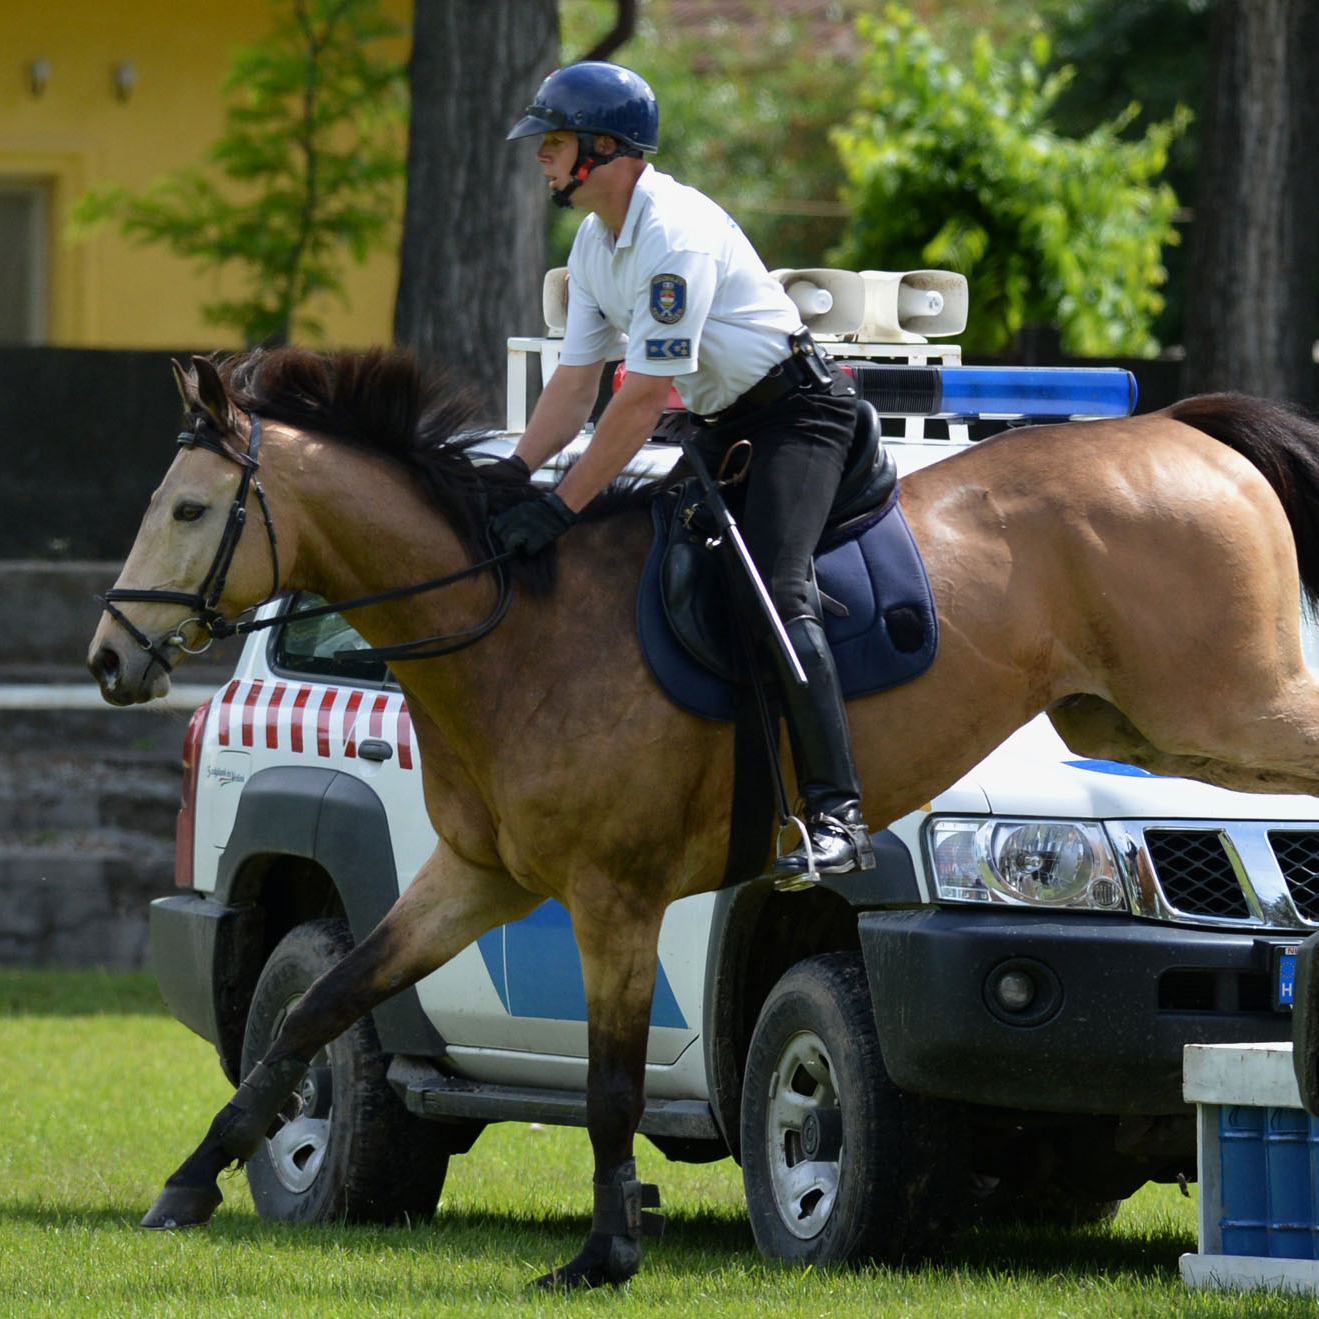 Magyar lovas rendőrség